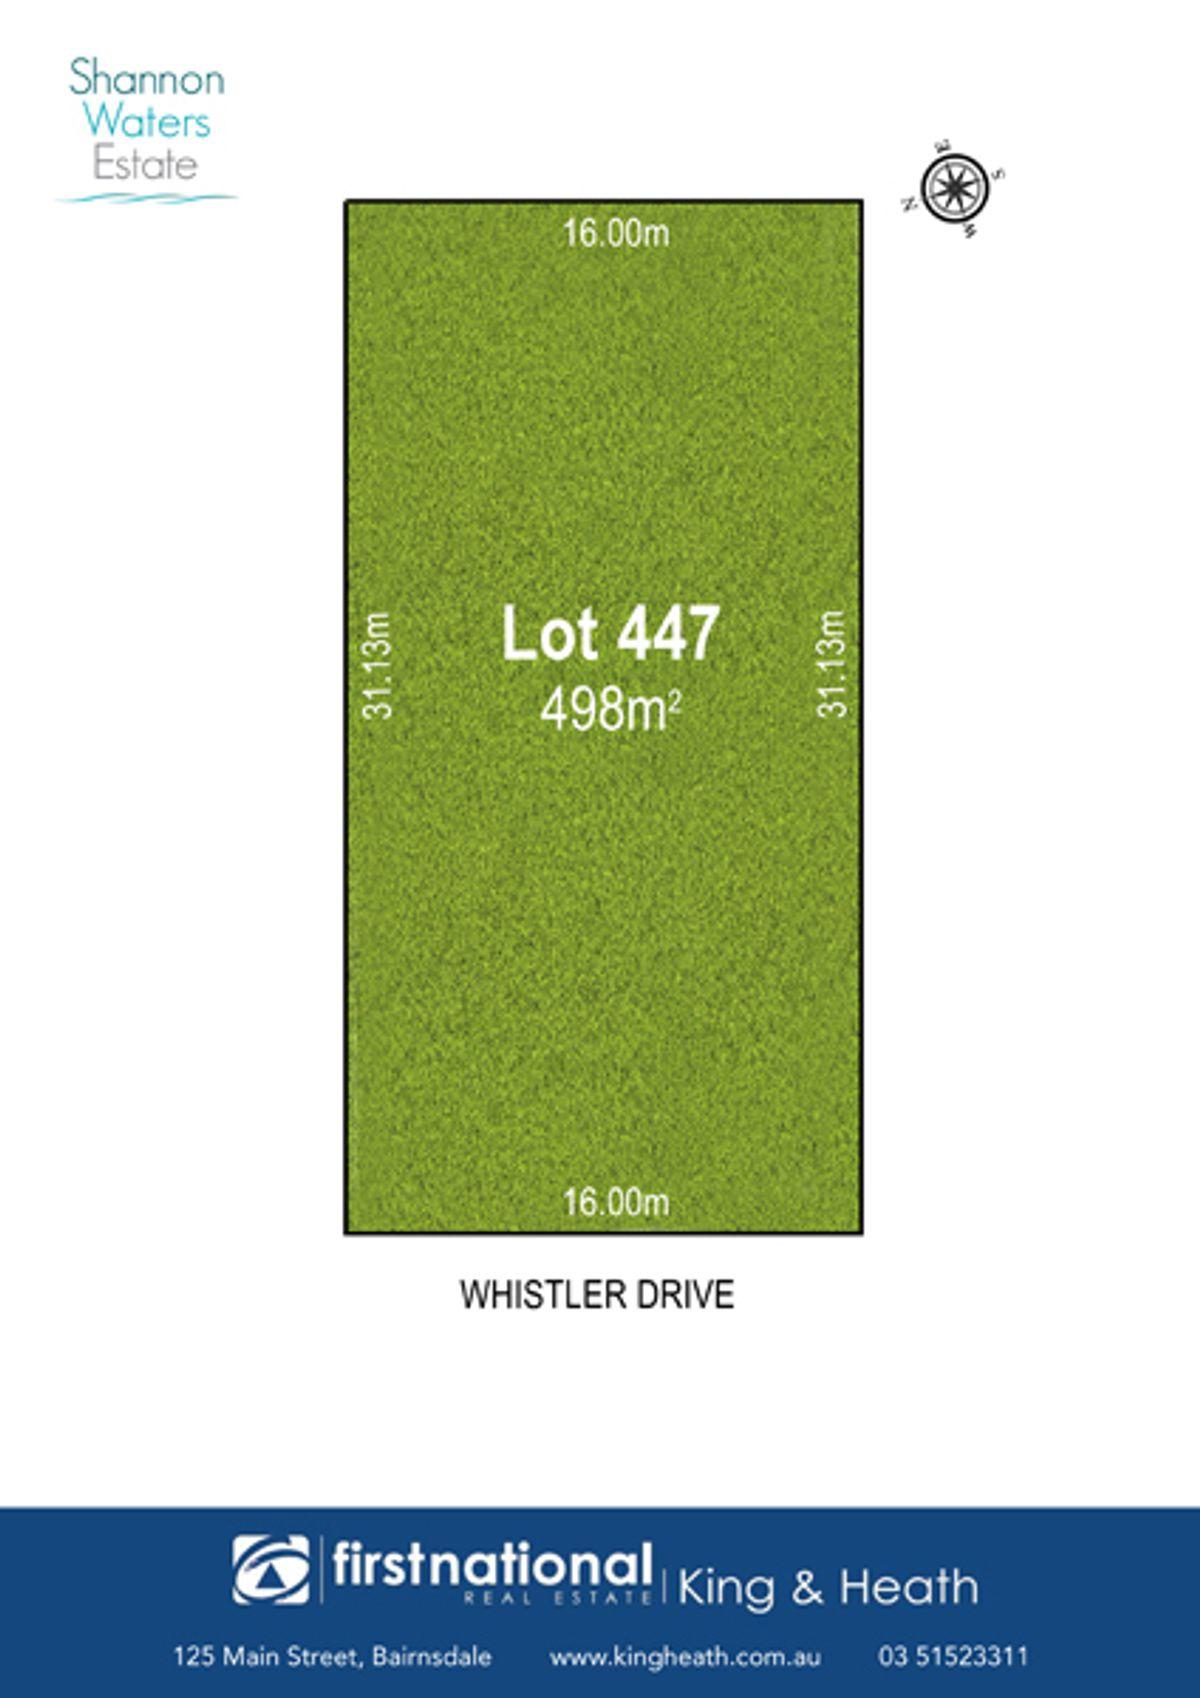 Lot 447 Whistler Drive, Bairnsdale, VIC 3875